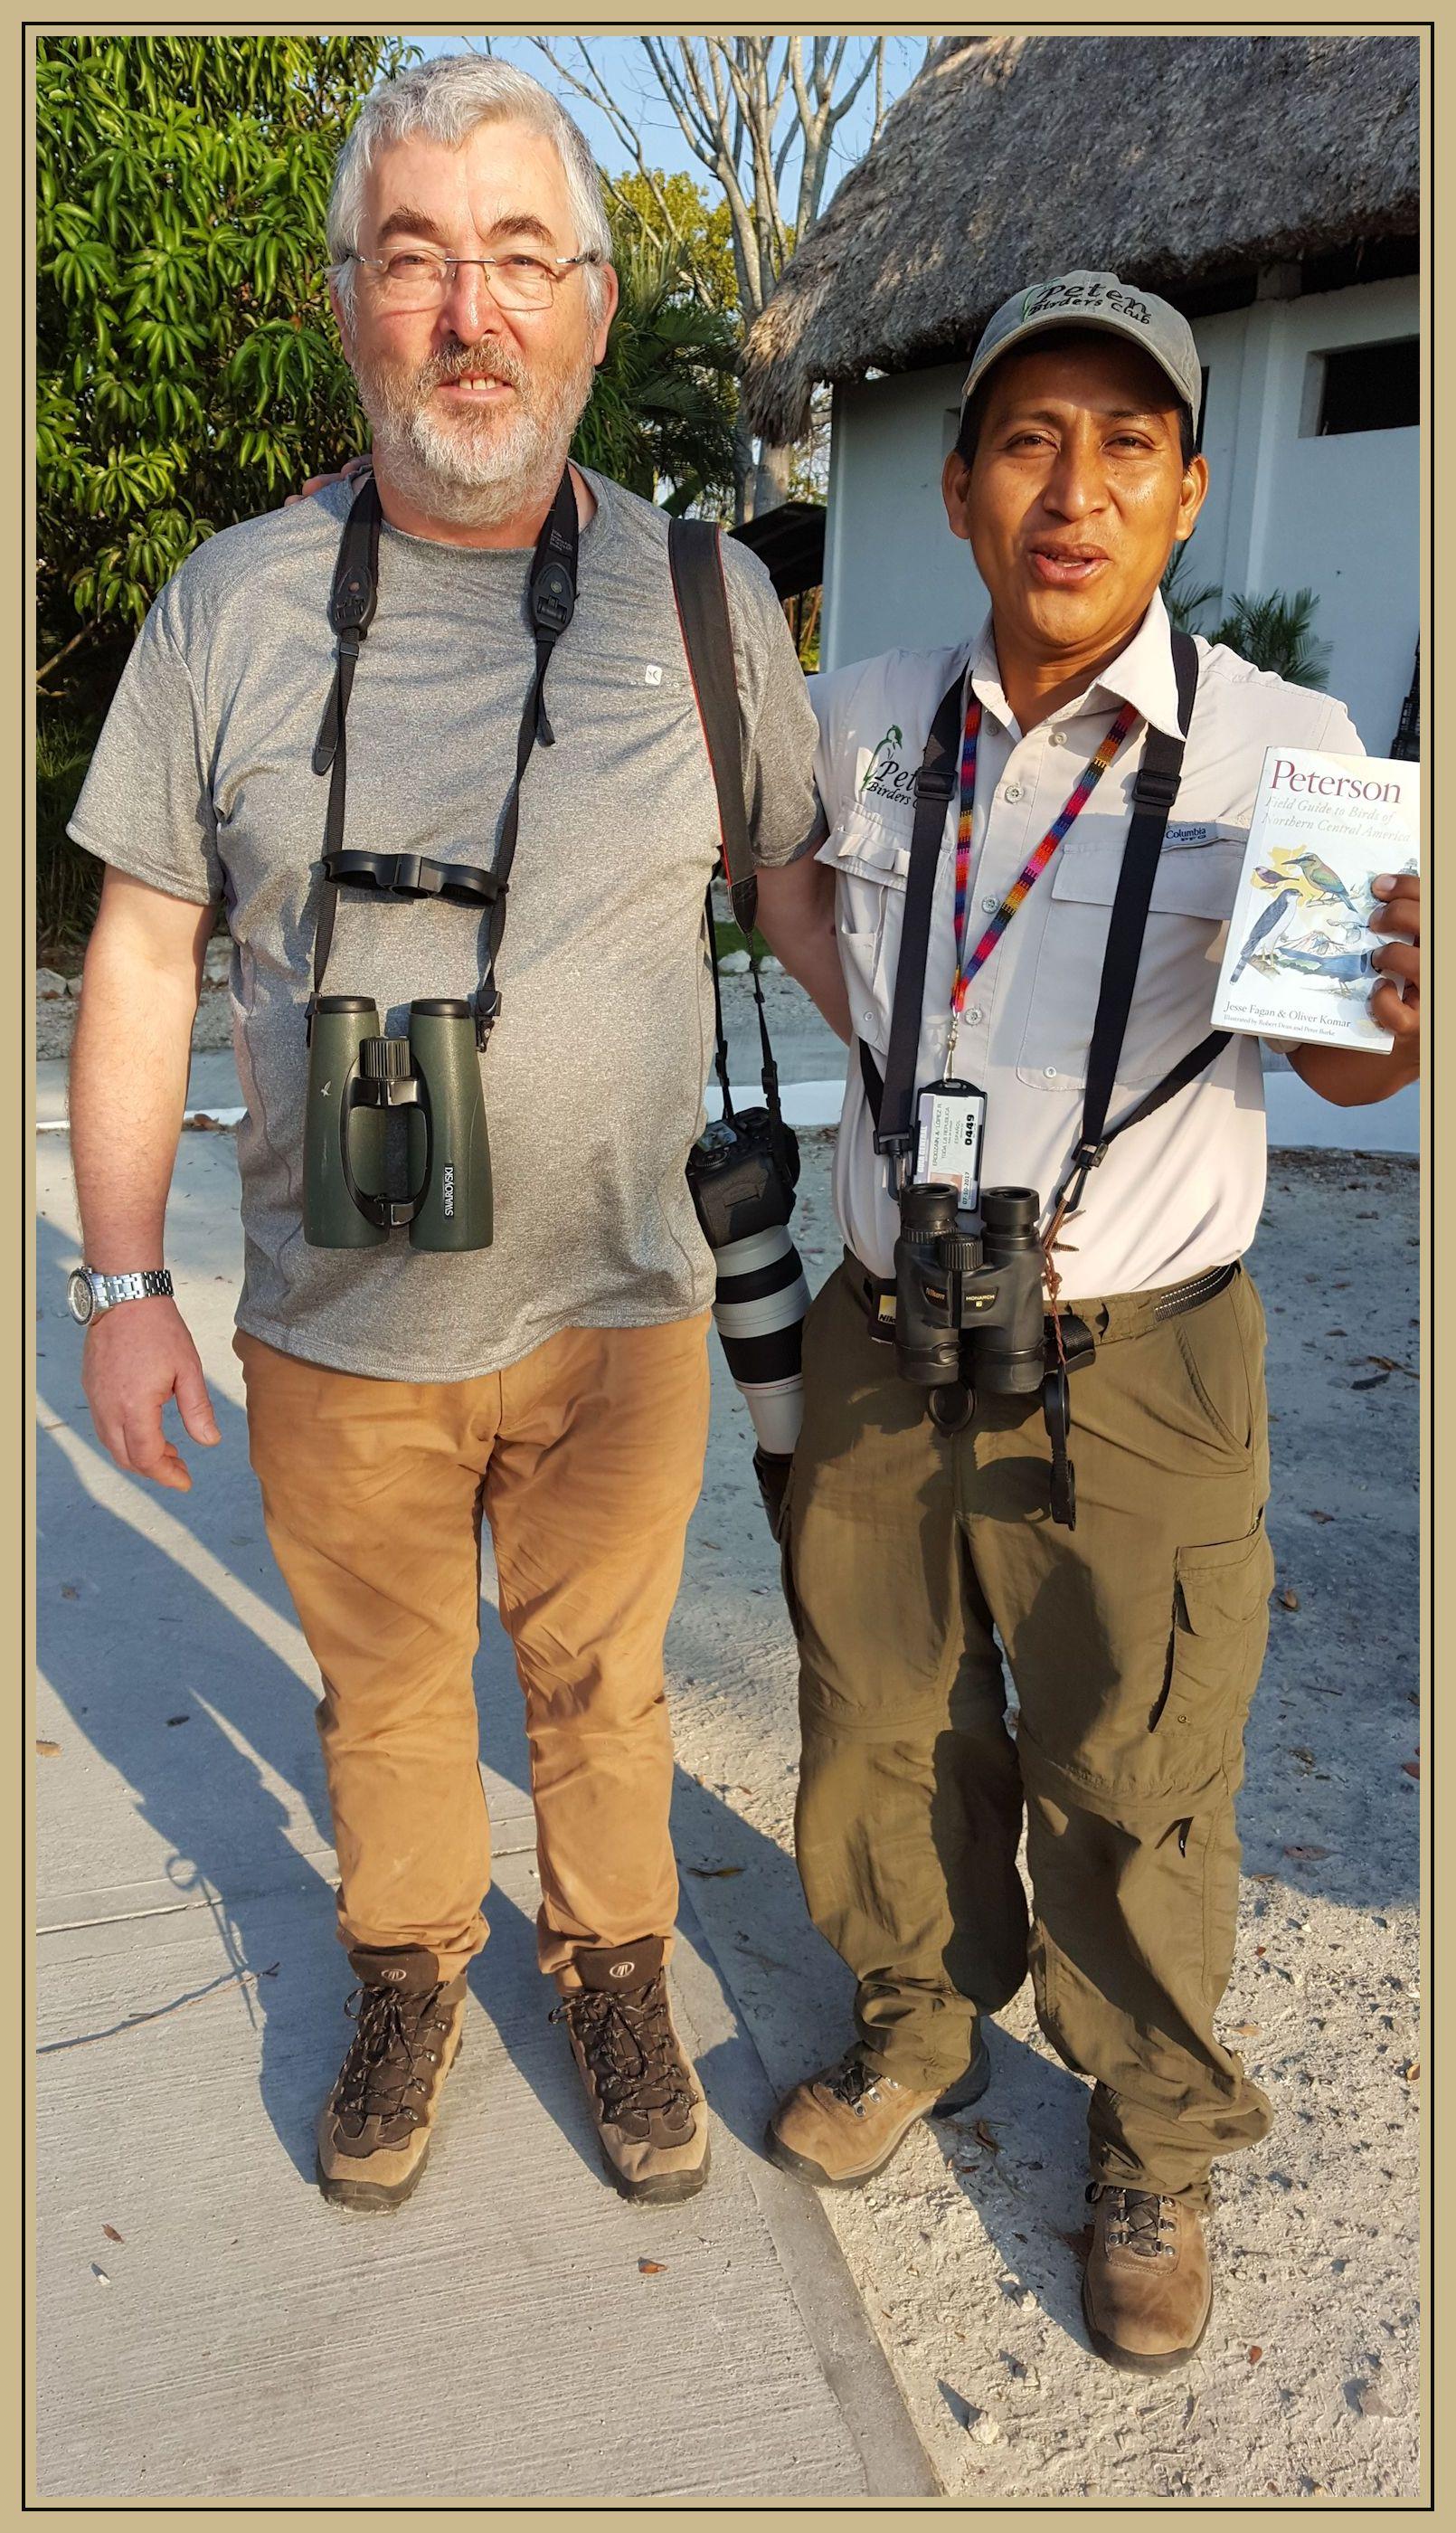 20170328_071132 Guide ornithologique-.jpg